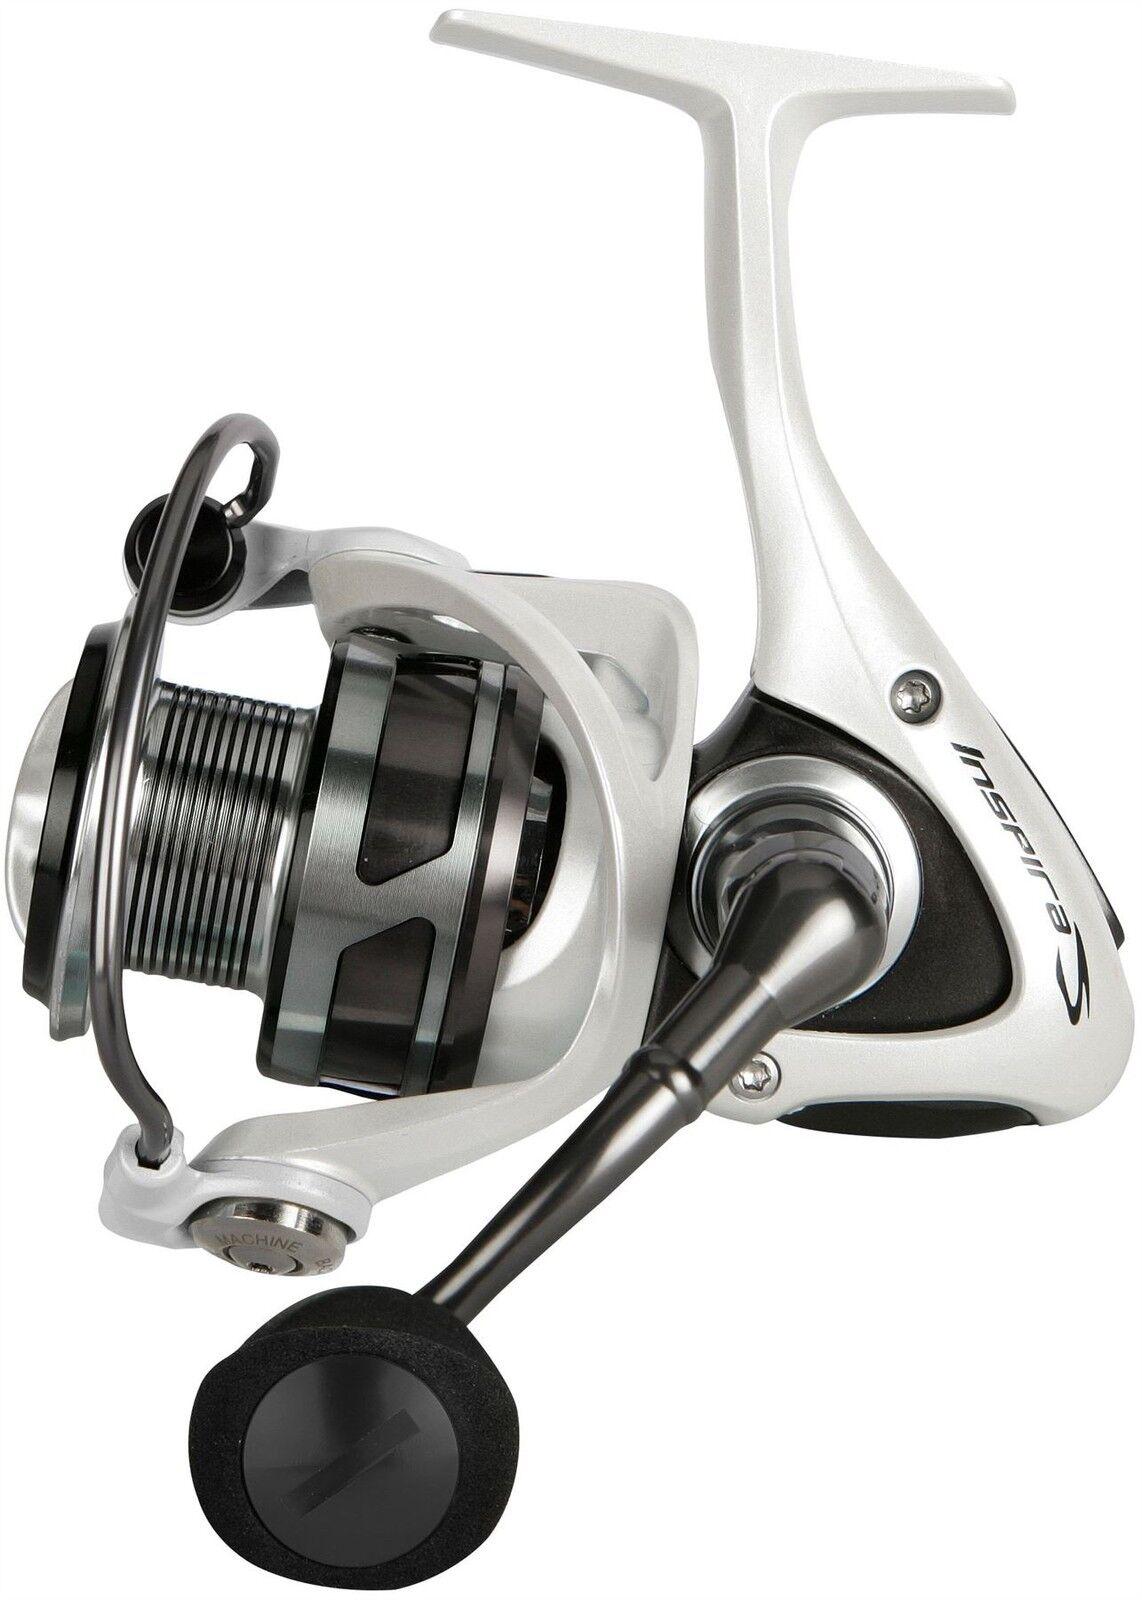 Okuma Inspira ISX-30 FD 8+1bb 8+1bb 8+1bb (inc.Spare spool) Spinning Reel 50d53c